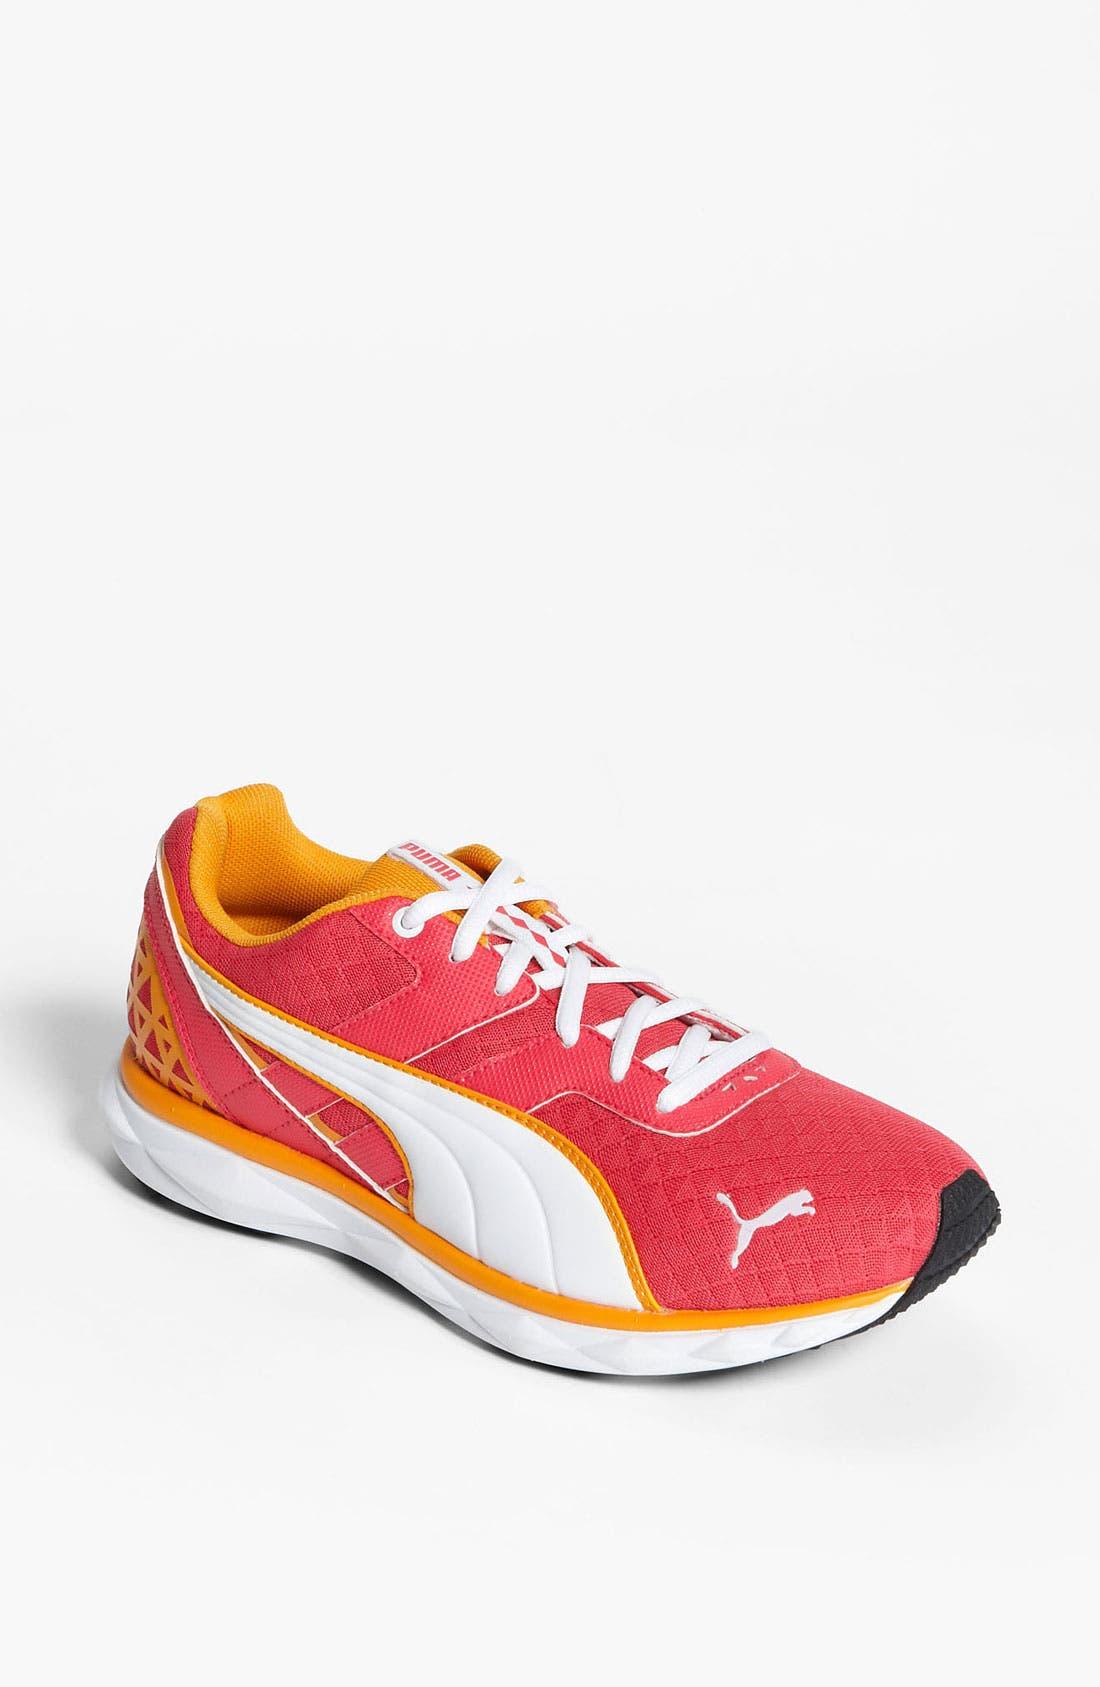 Main Image - PUMA 'Pumagility Speed 2' Running Shoe (Women)